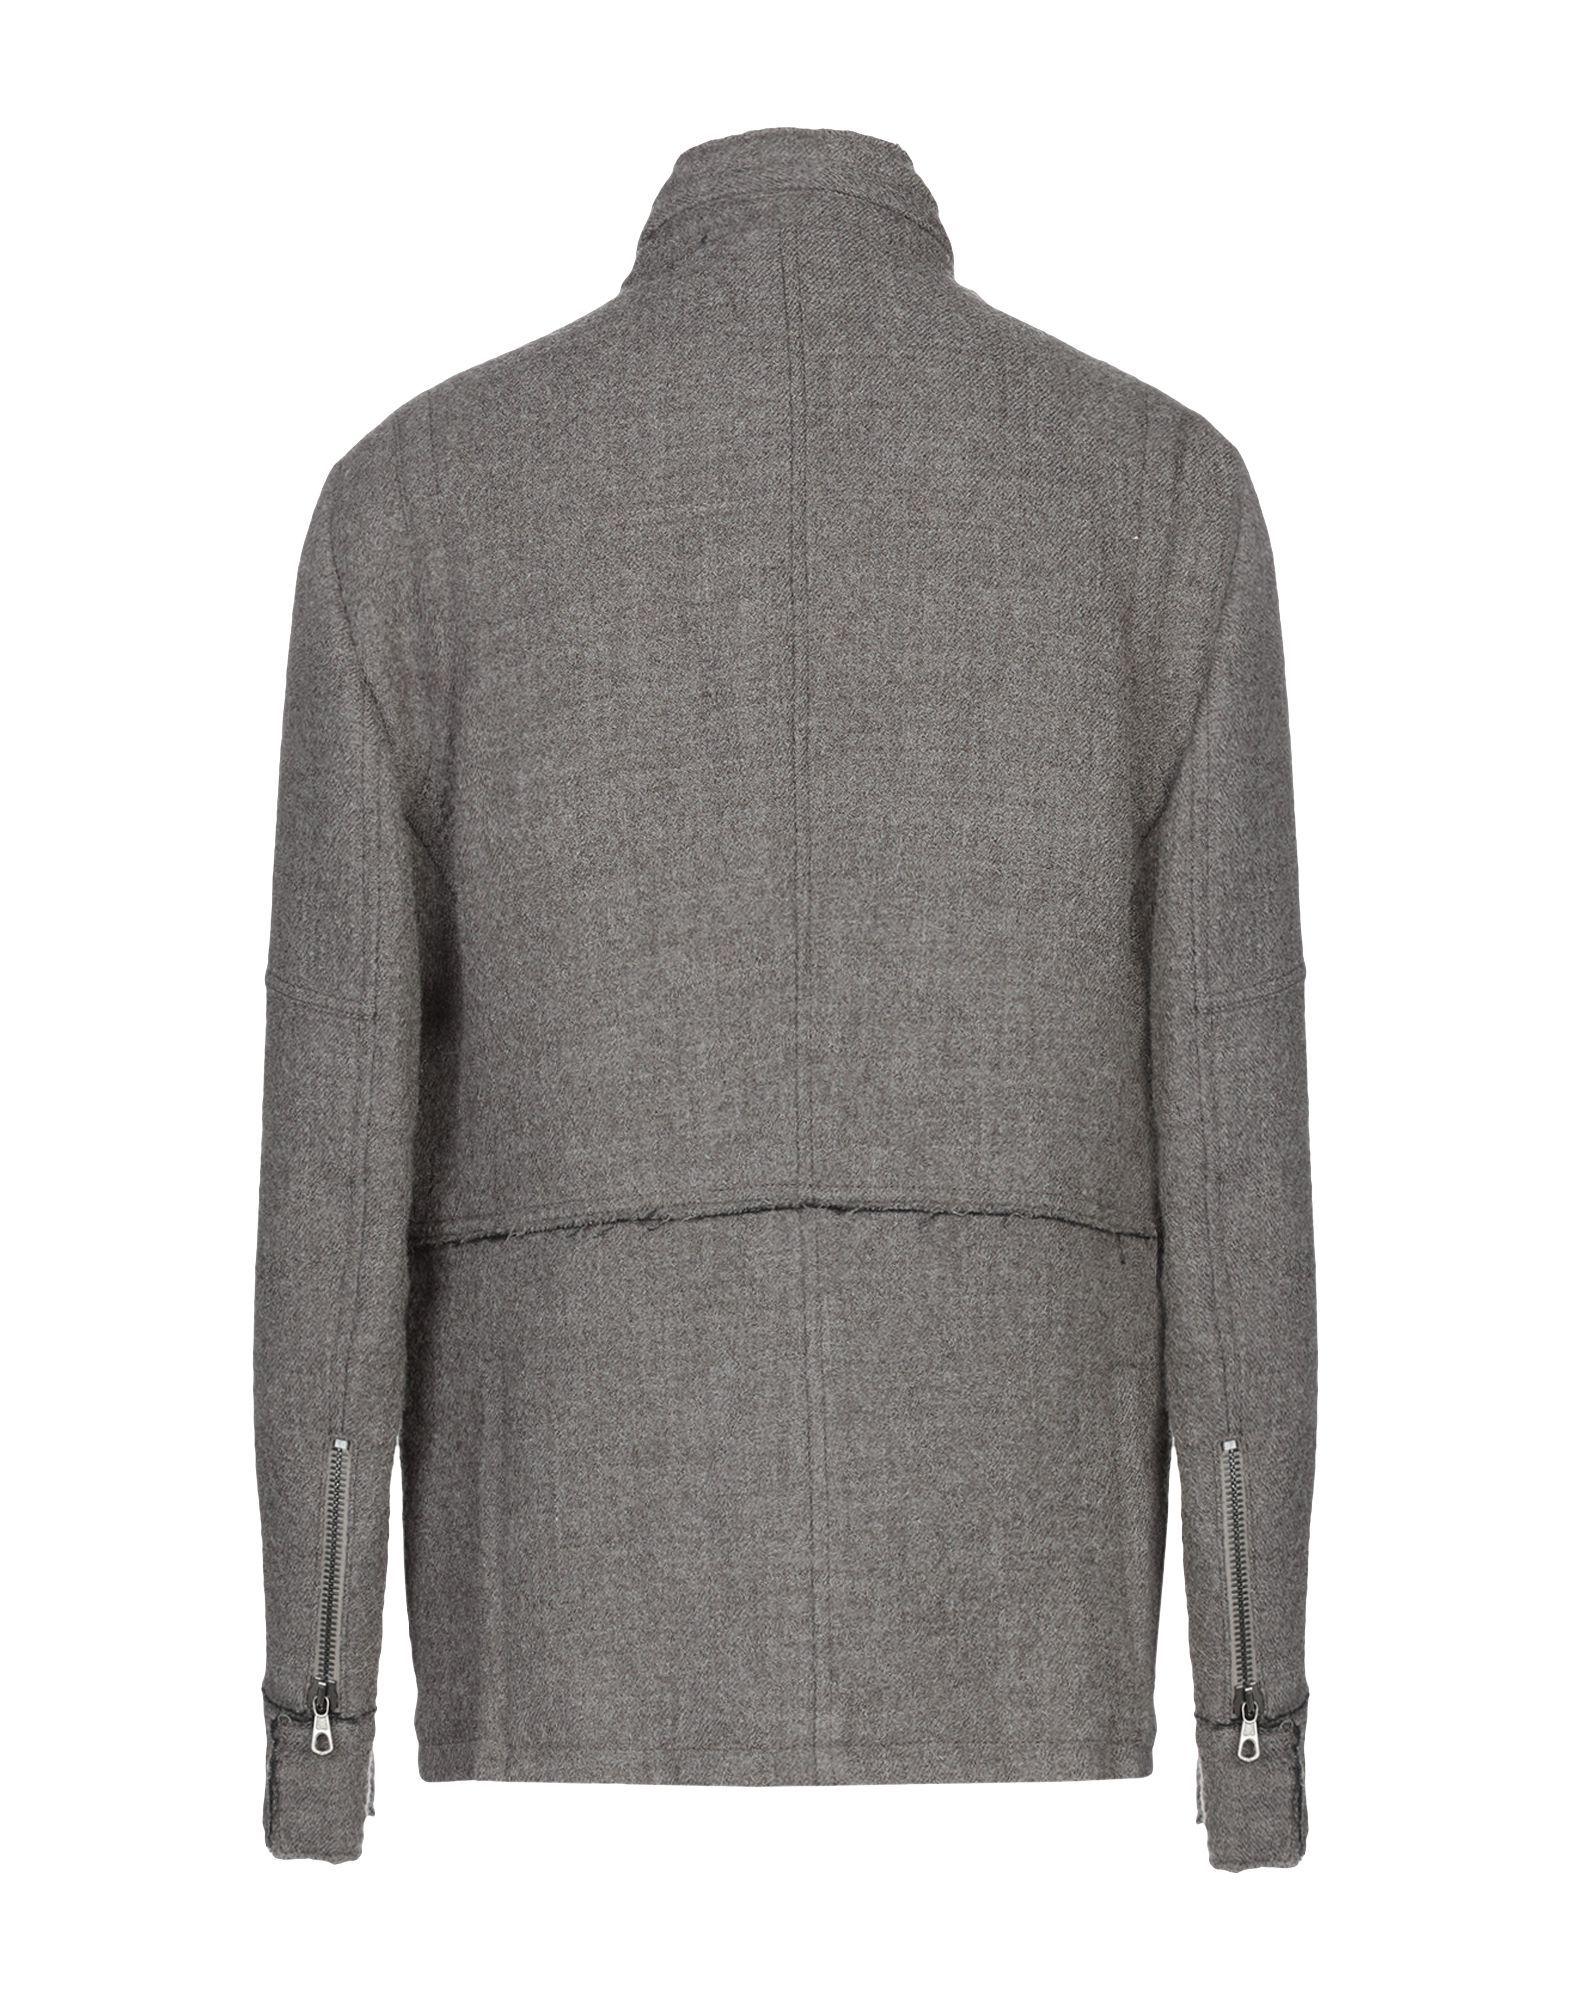 Messagerie Lead Virgin Wool Safari Style Jacket